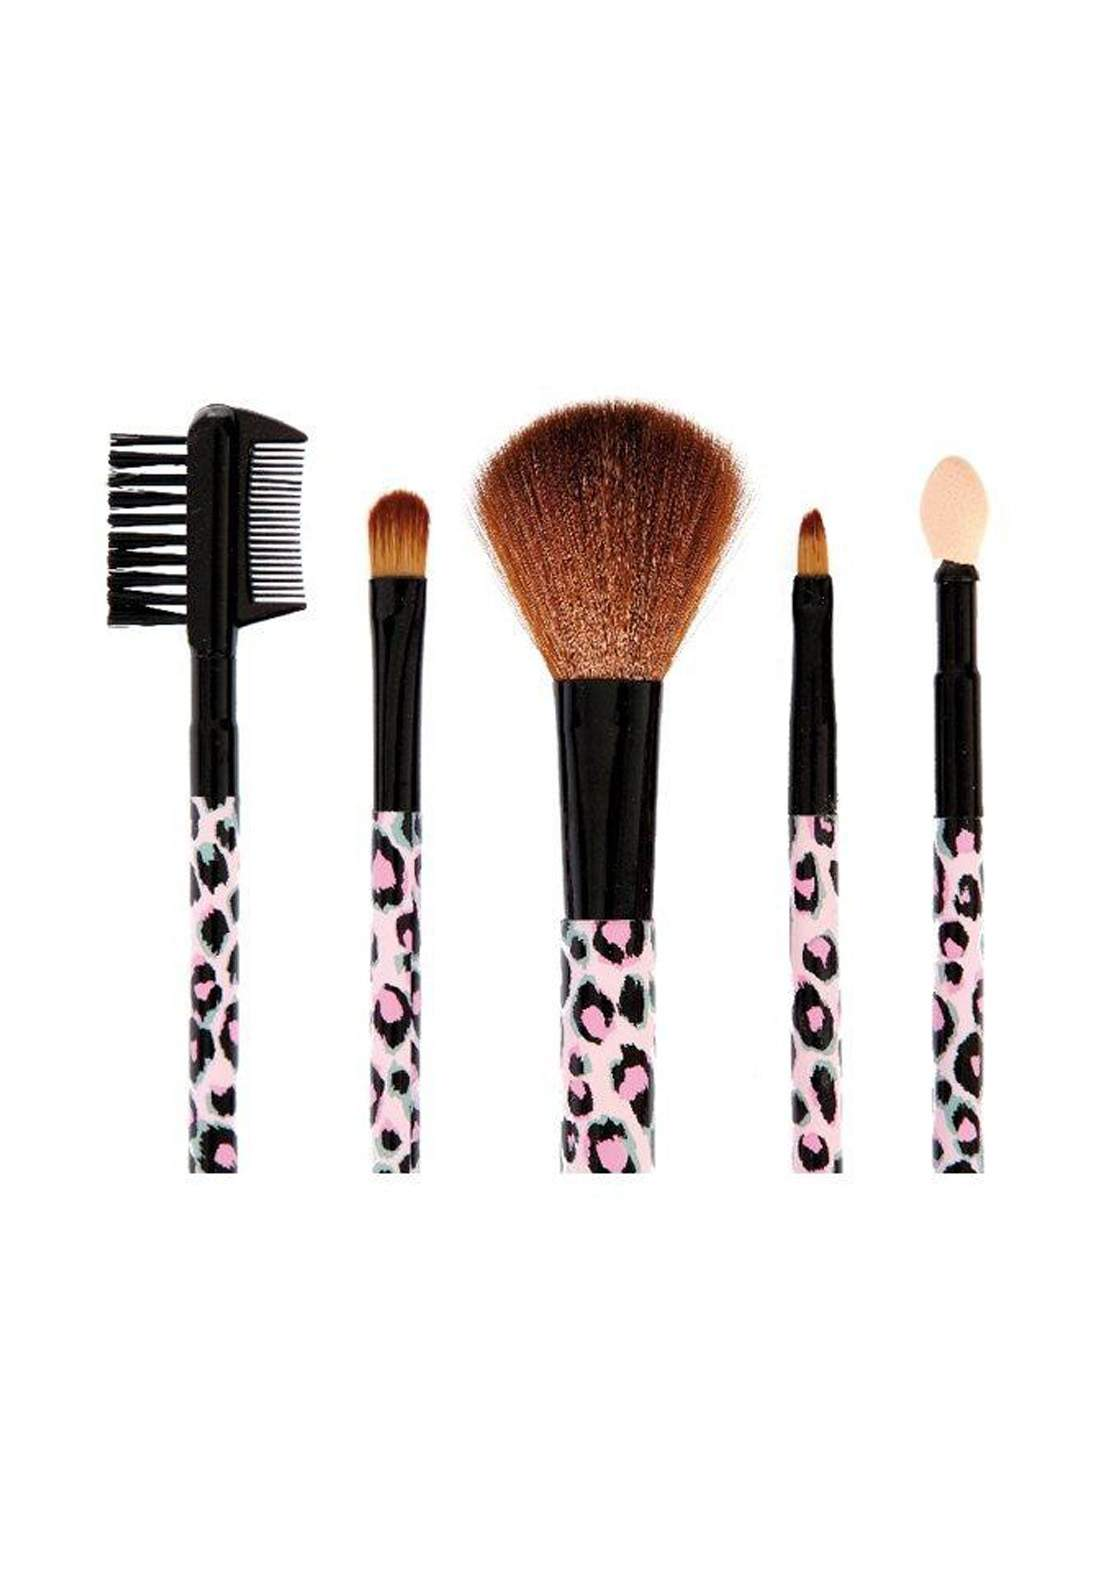 Gold Beauty EP 921 Makeup Brush Set سيت فرش مكياج